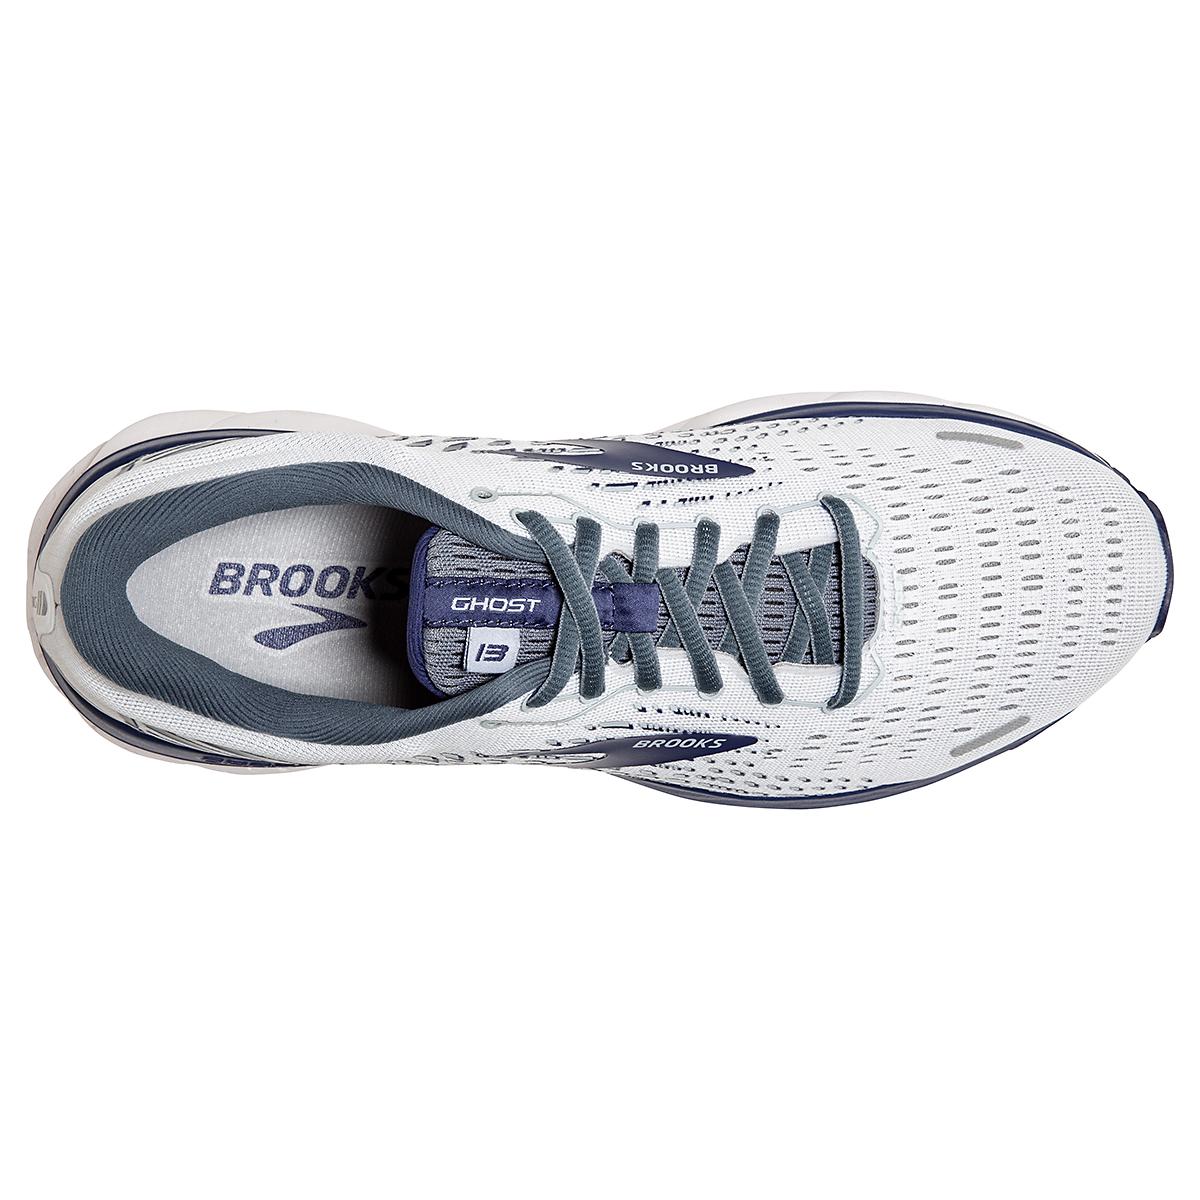 Men's Brooks Ghost 13 Running Shoe - Color: White/Grey/Deep Cobalt - Size: 7 - Width: Extra Wide, White/Grey/Deep Cobalt, large, image 4